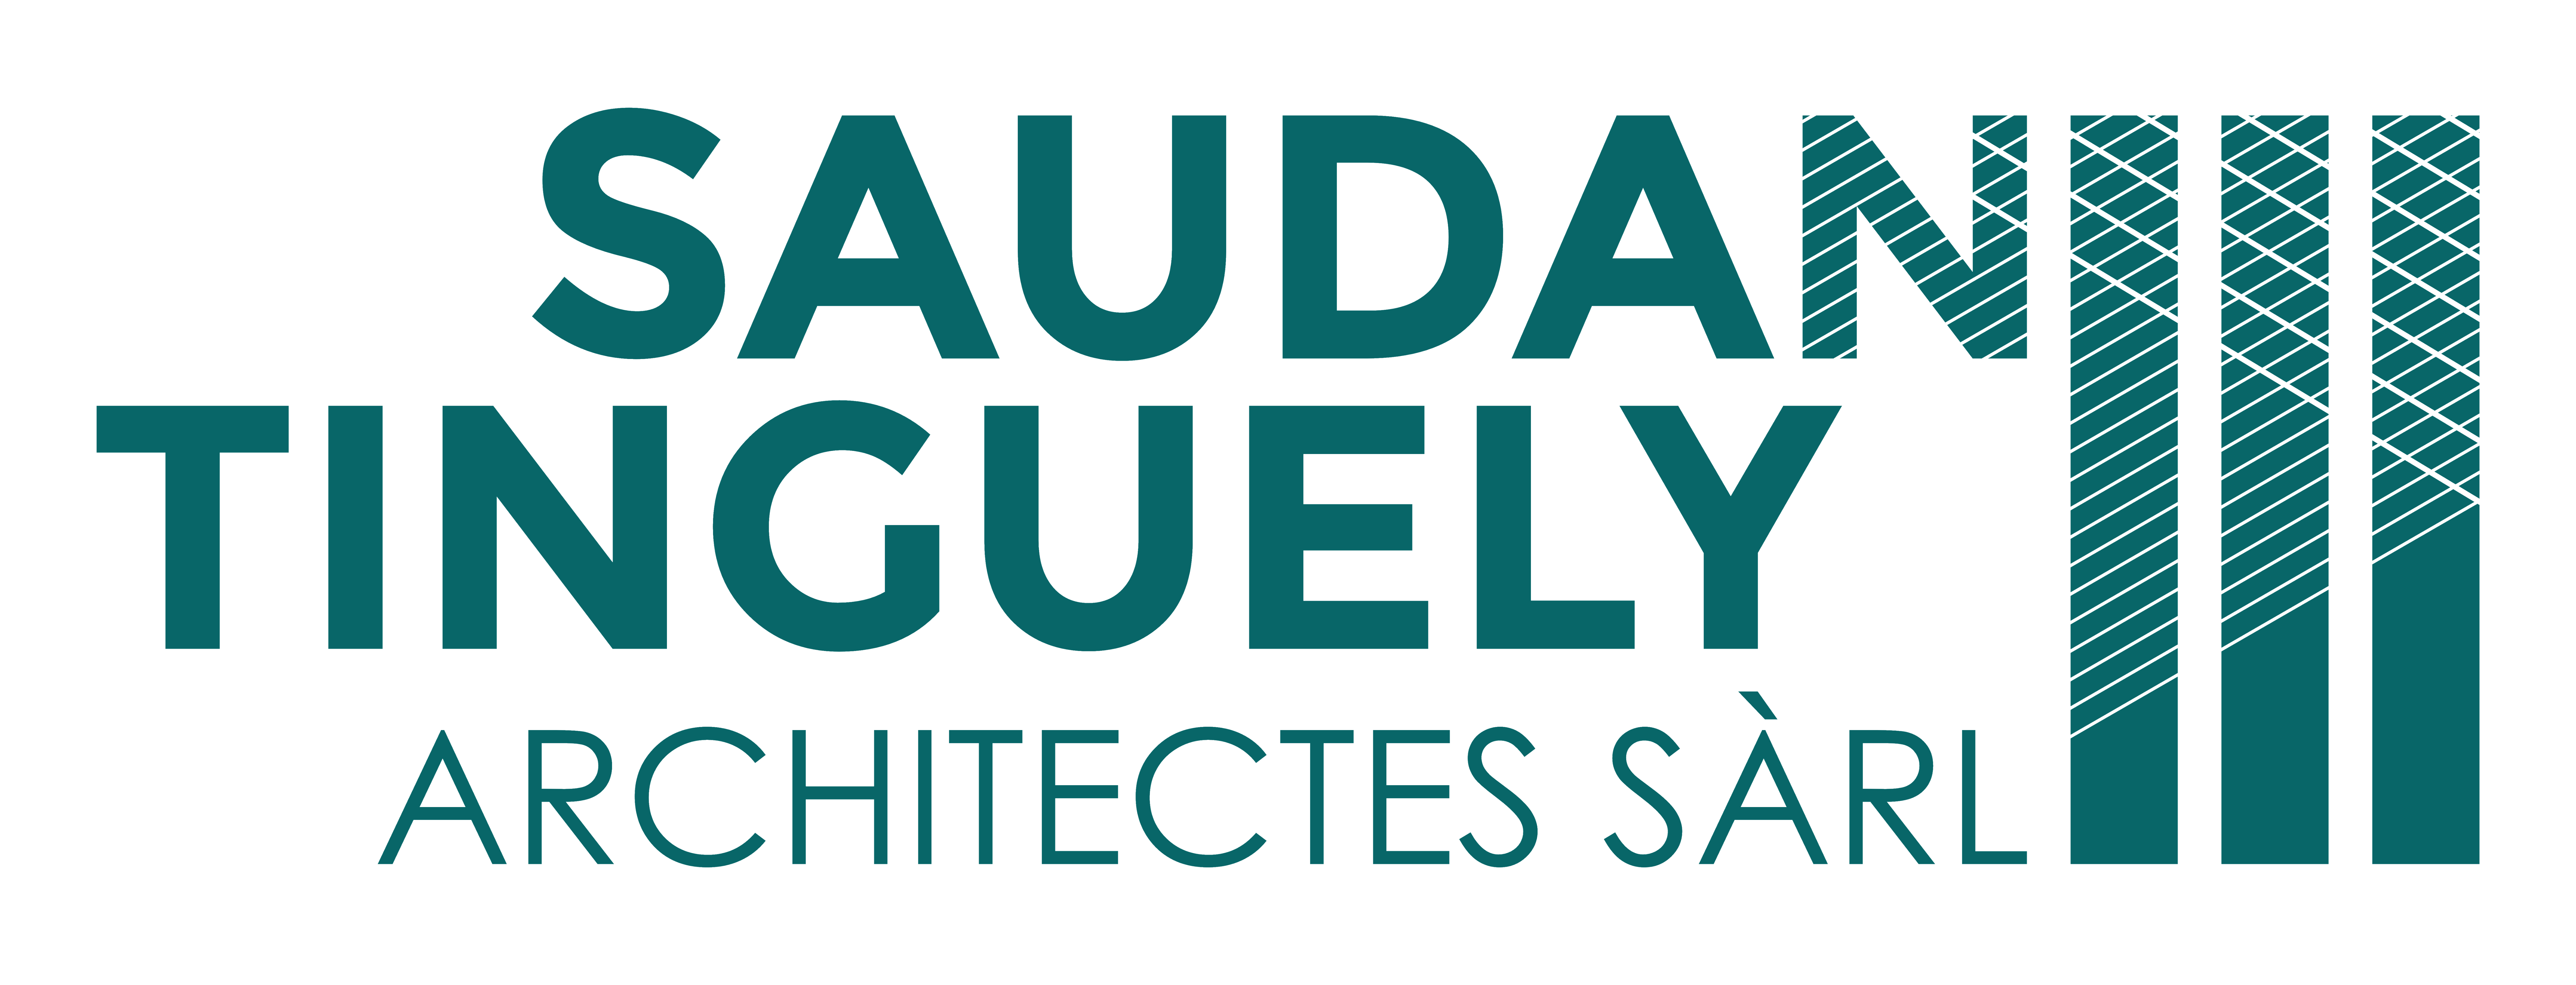 Saudan Tinguely Architectes SÀRL